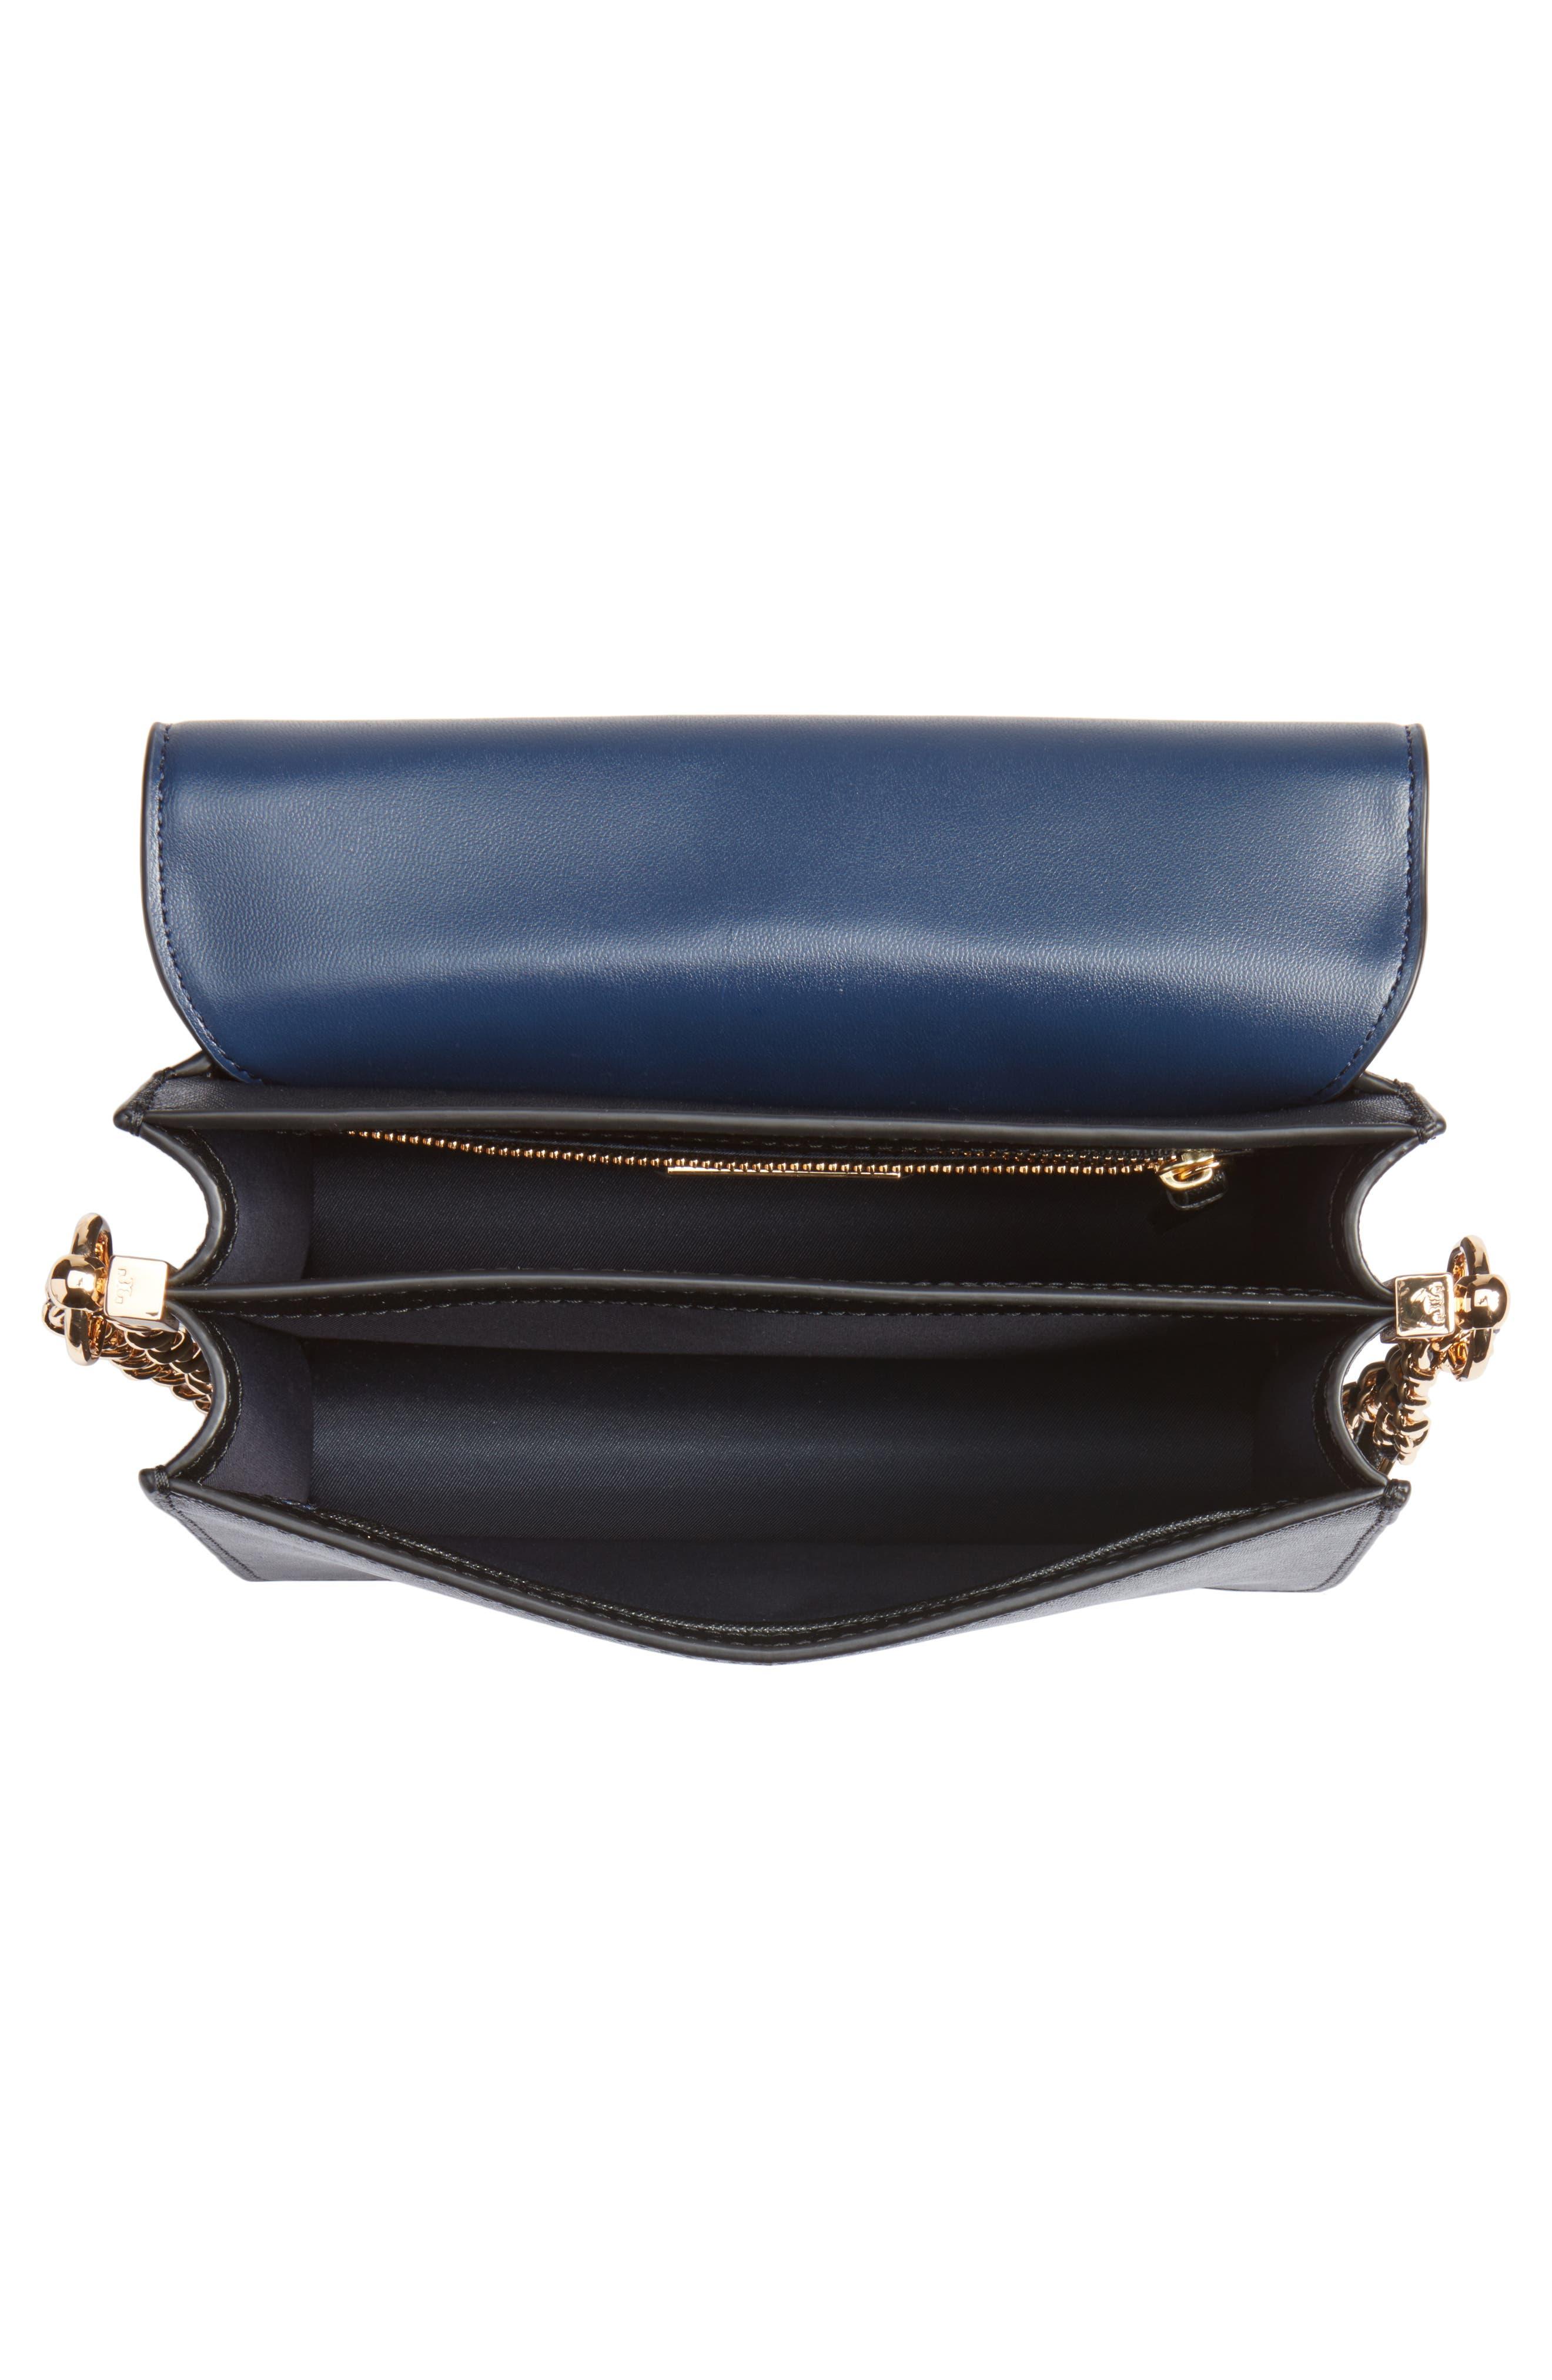 Robinson Convertible Leather Shoulder Bag,                             Alternate thumbnail 4, color,                             BLACK / ROYAL NAVY